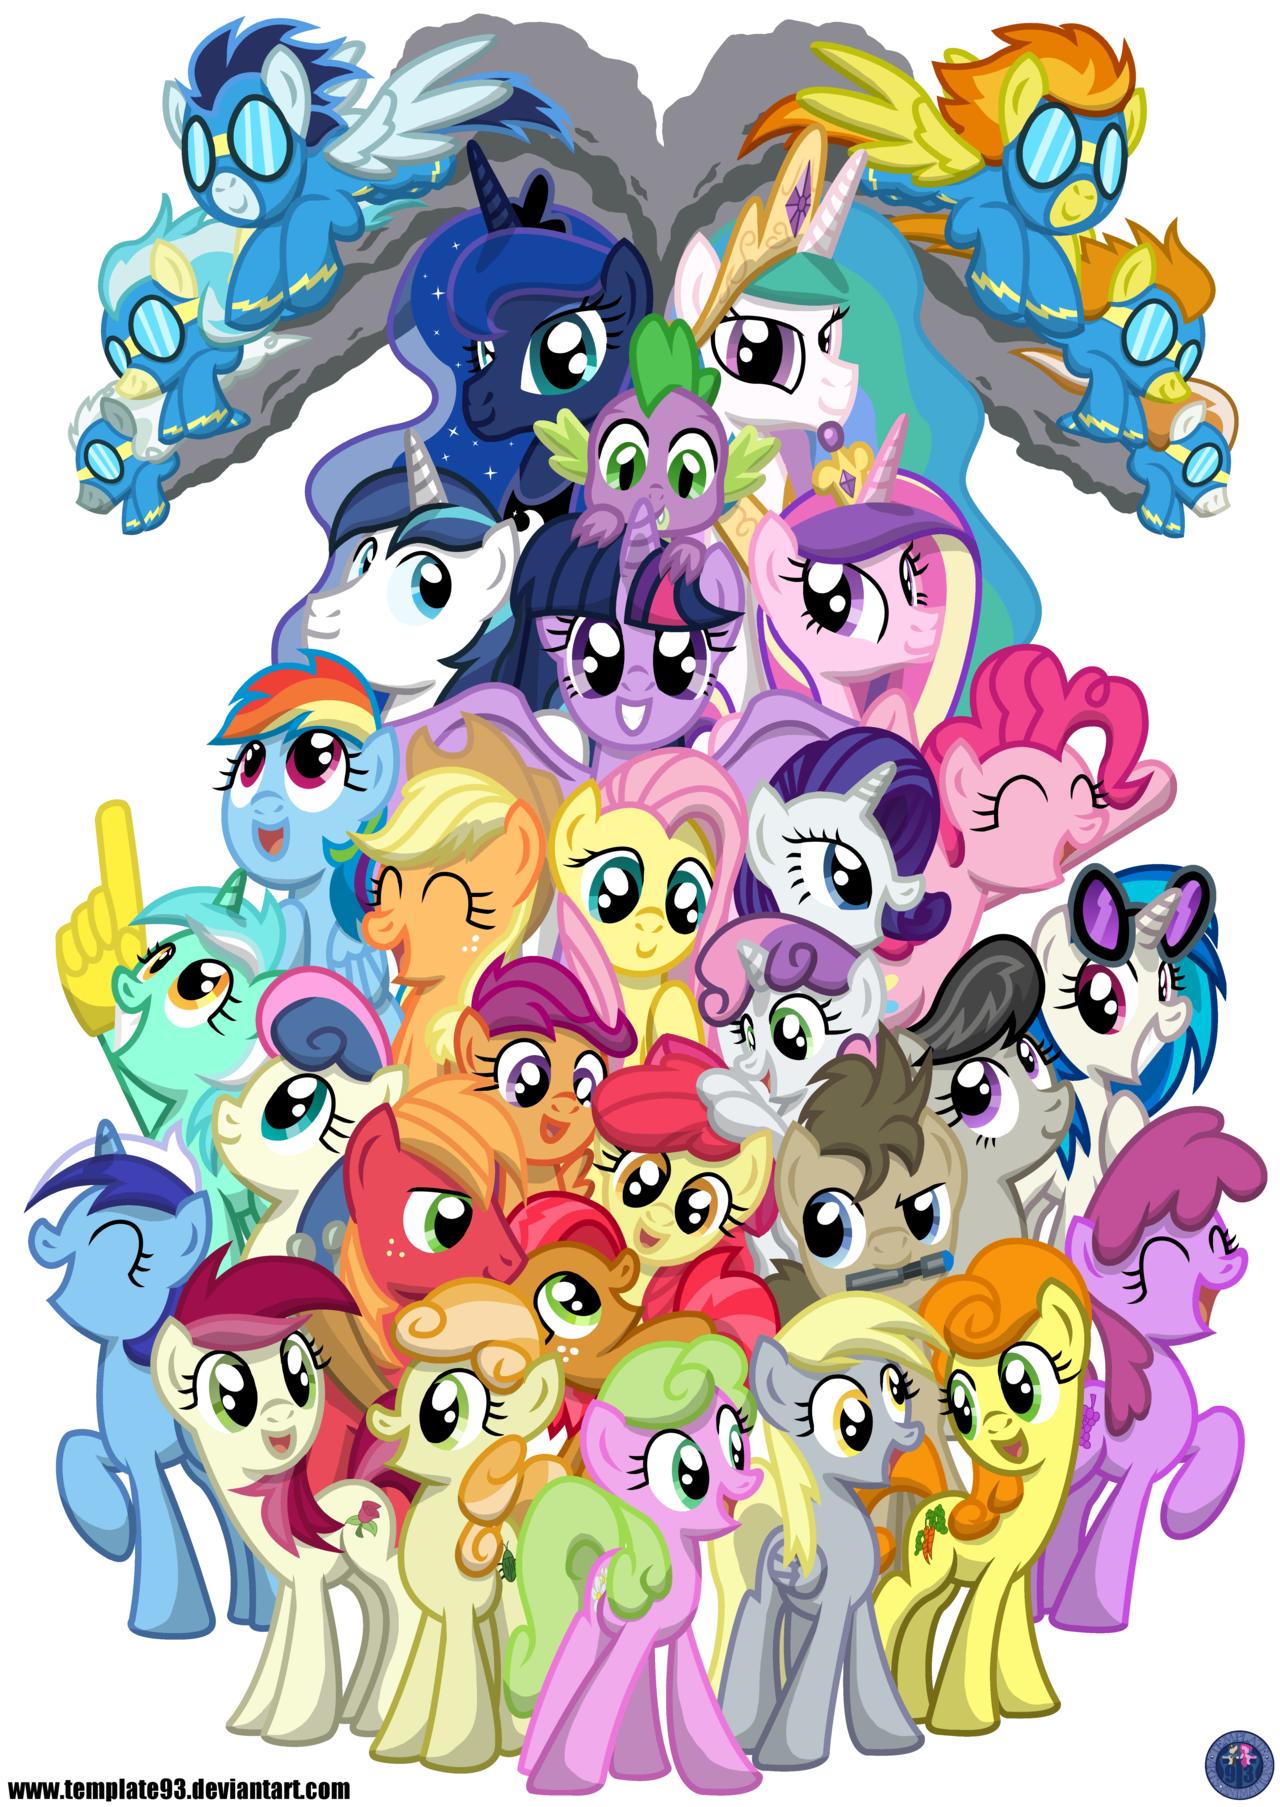 Mega Pony Shirt Design By Template93deviantart On DeviantArt